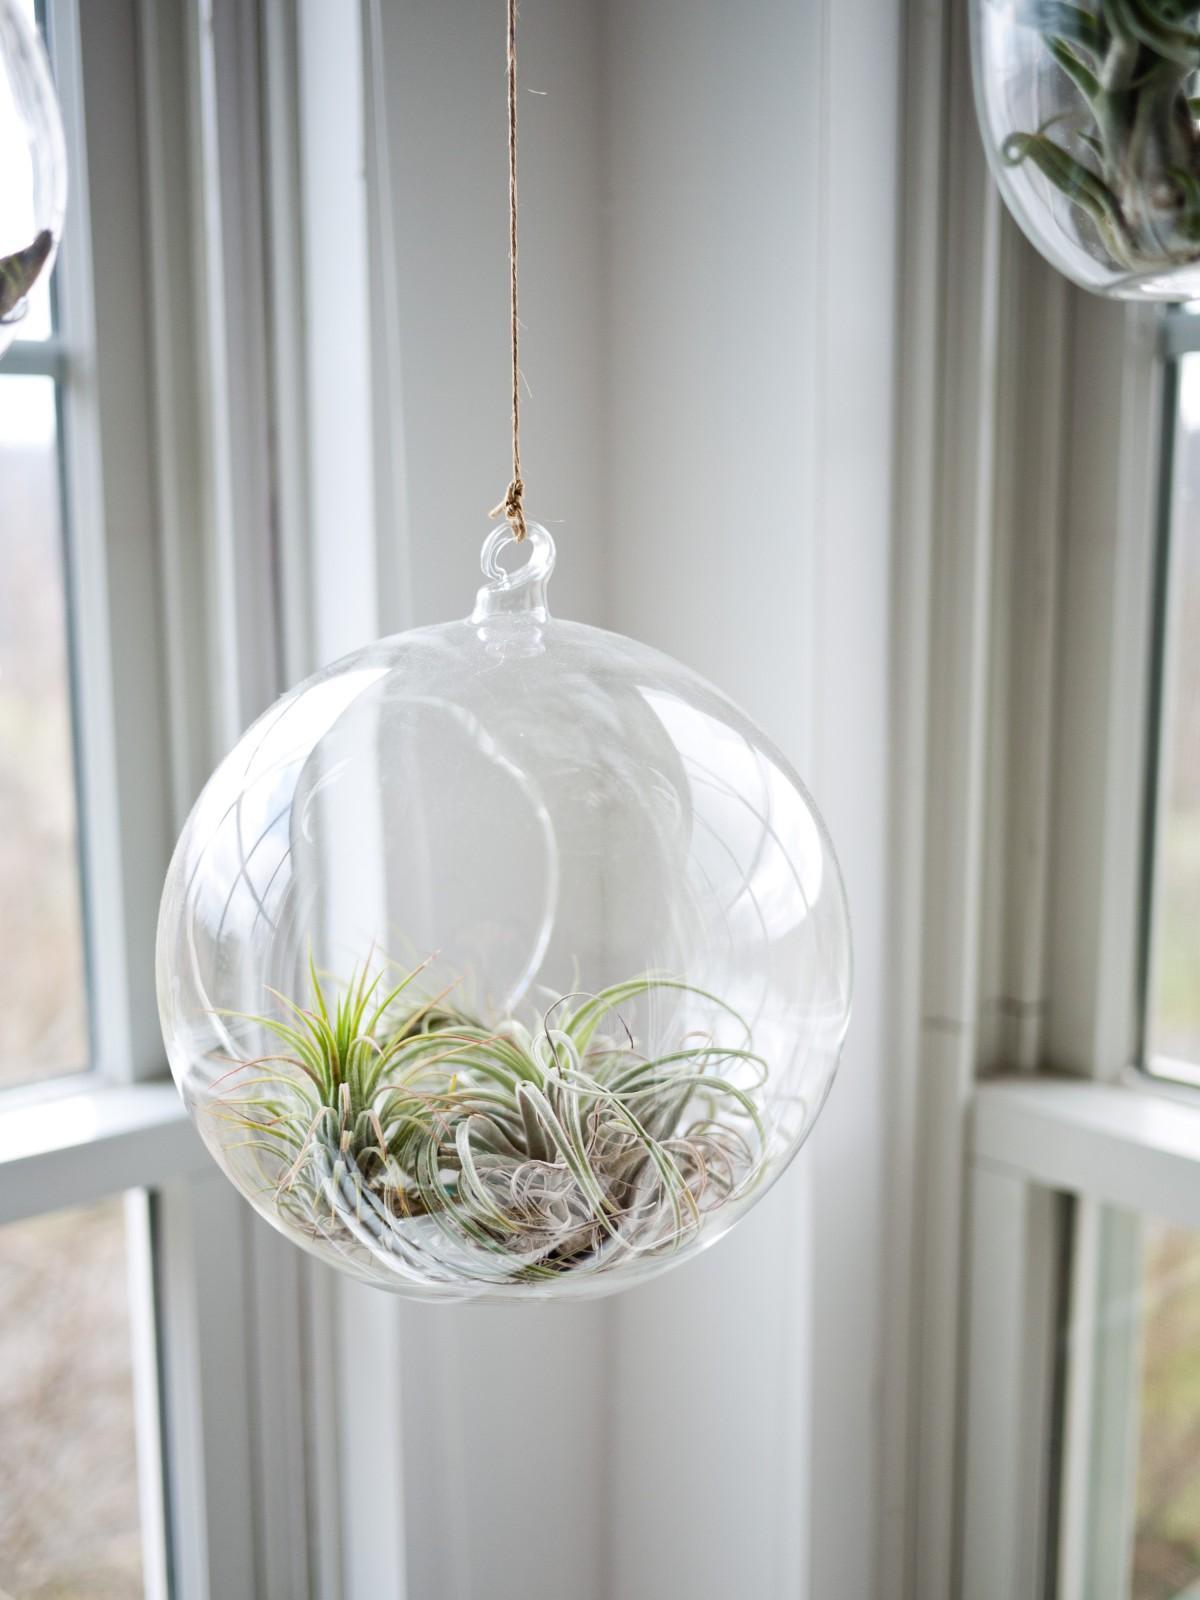 plant, string, round, window, glass, indoor, succulent, hanging, lighting, globe, interior design, publicdomain, light fixture